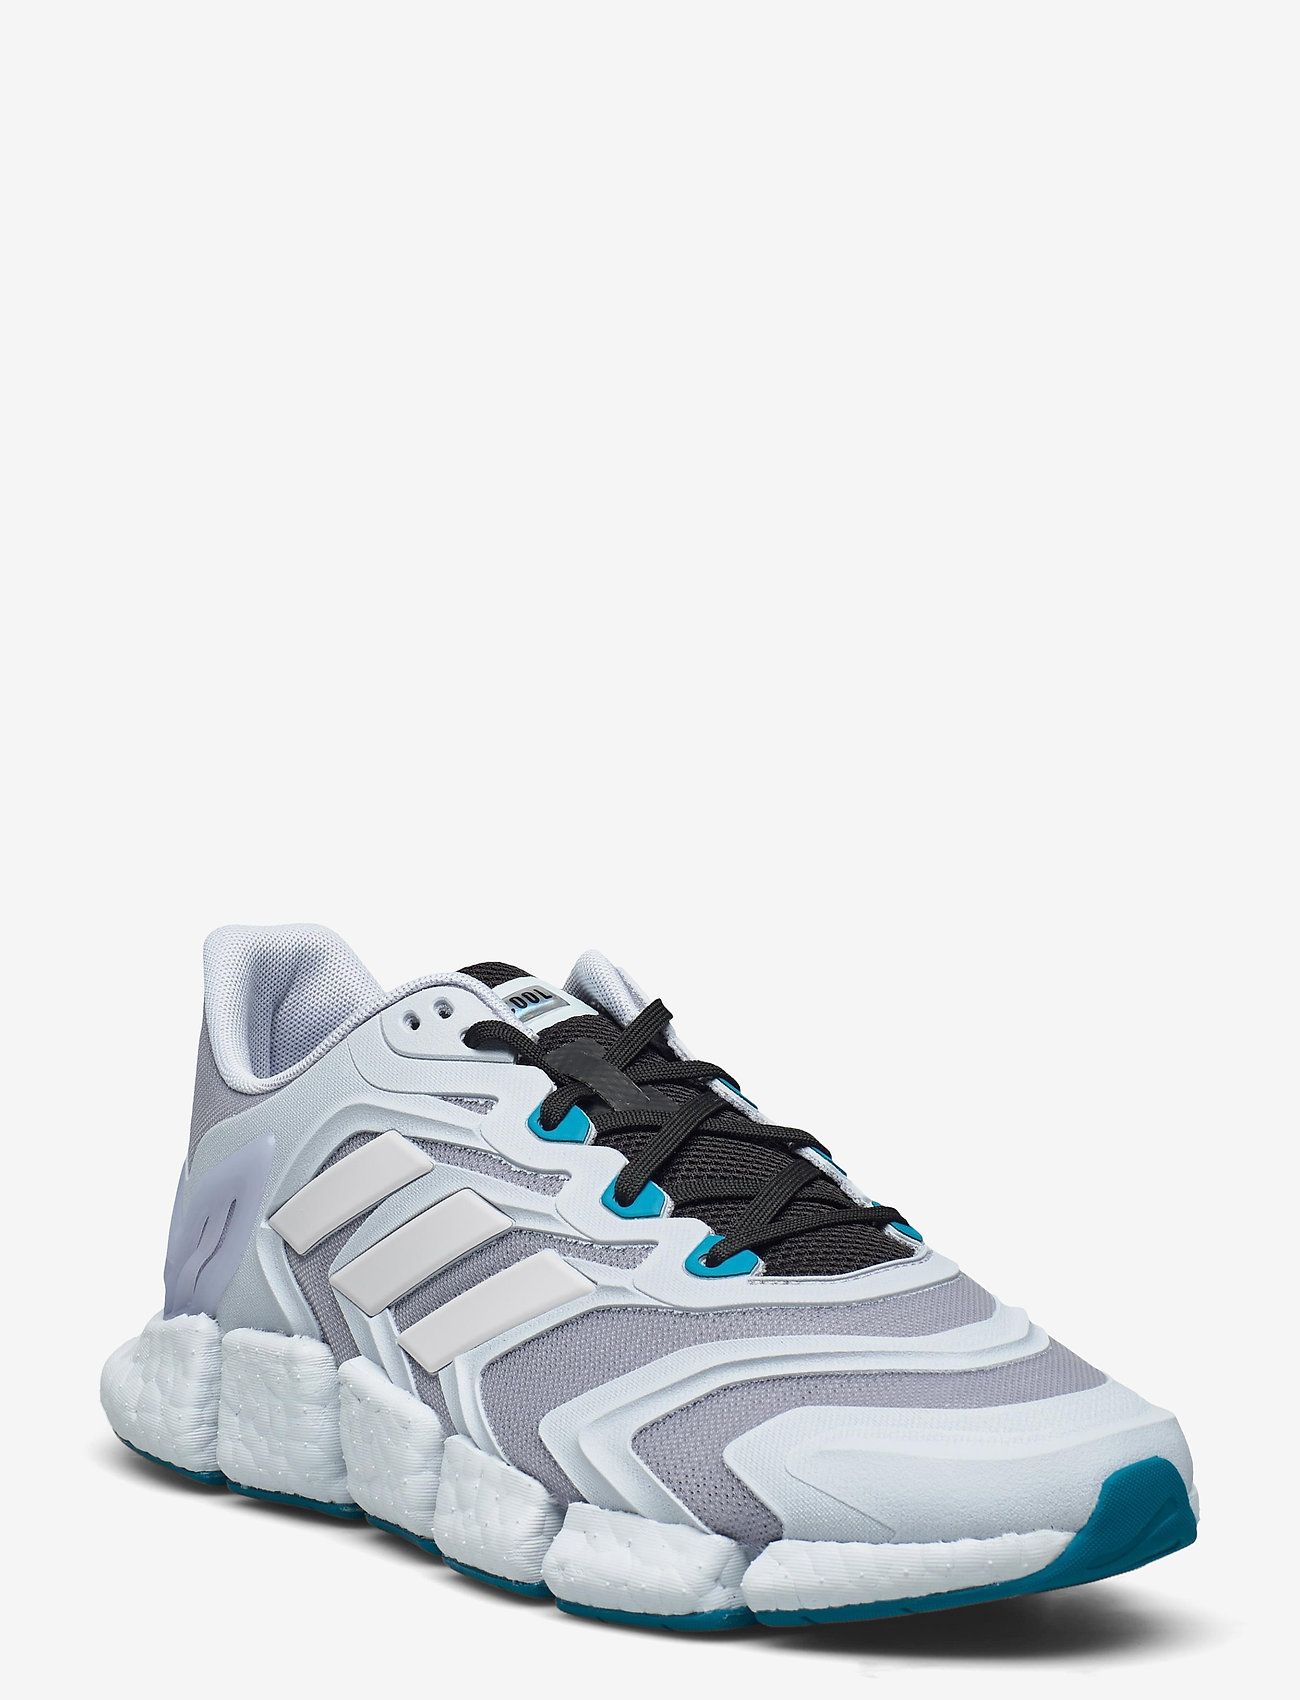 adidas Performance - Climacool Vento Heat.RDY - running shoes - halblu/dshgry/cblack - 0